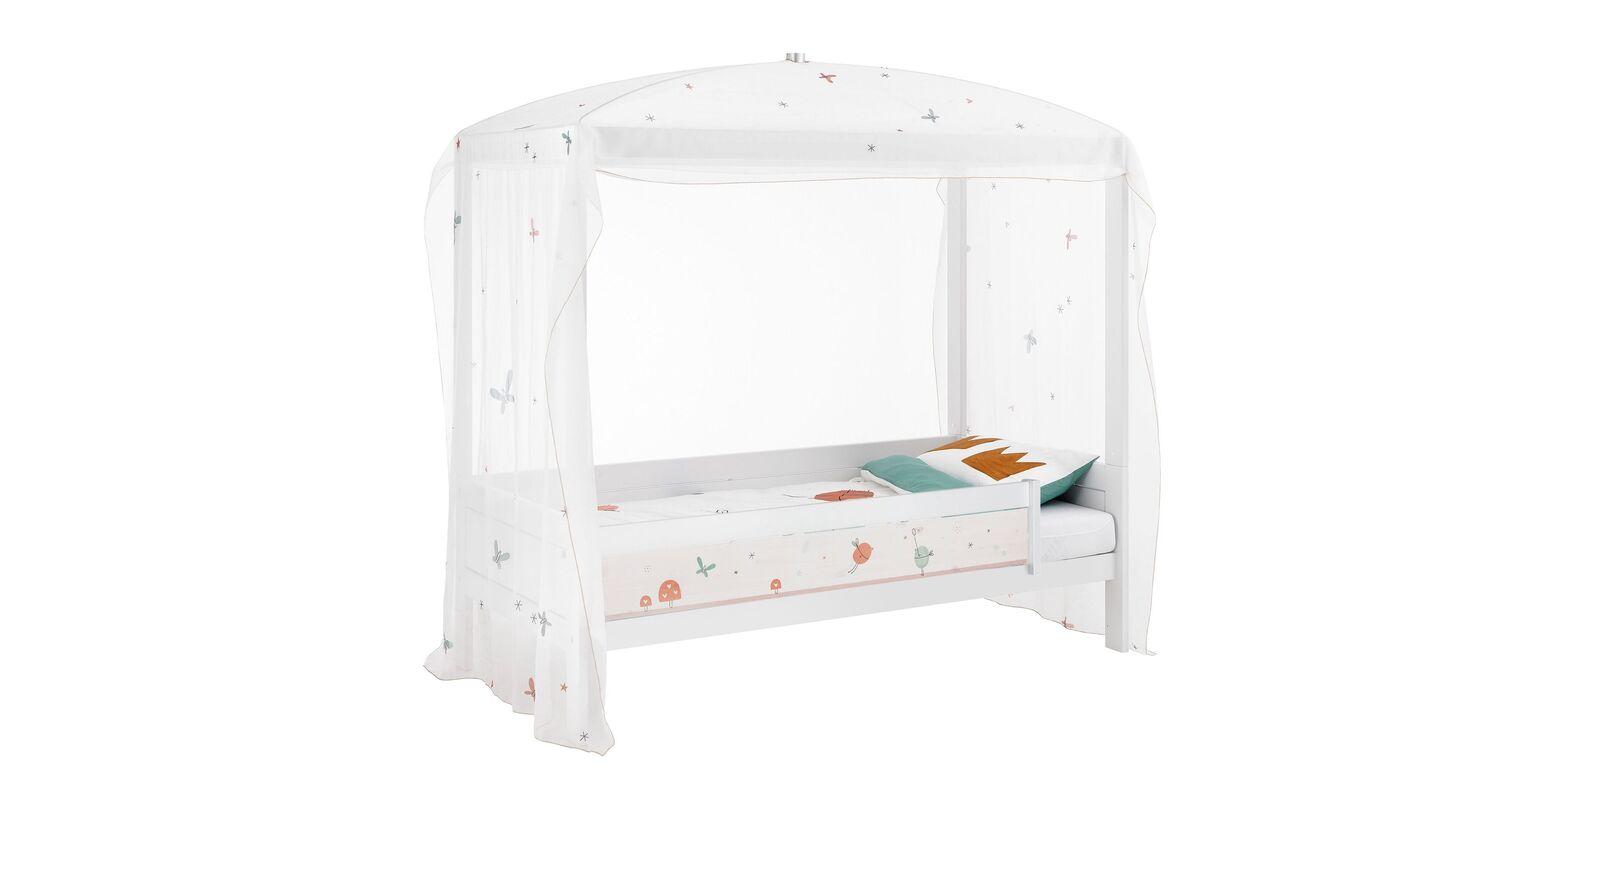 LIFETIME Kinder-Himmeblett Fairy Dust inklusive Vorhang